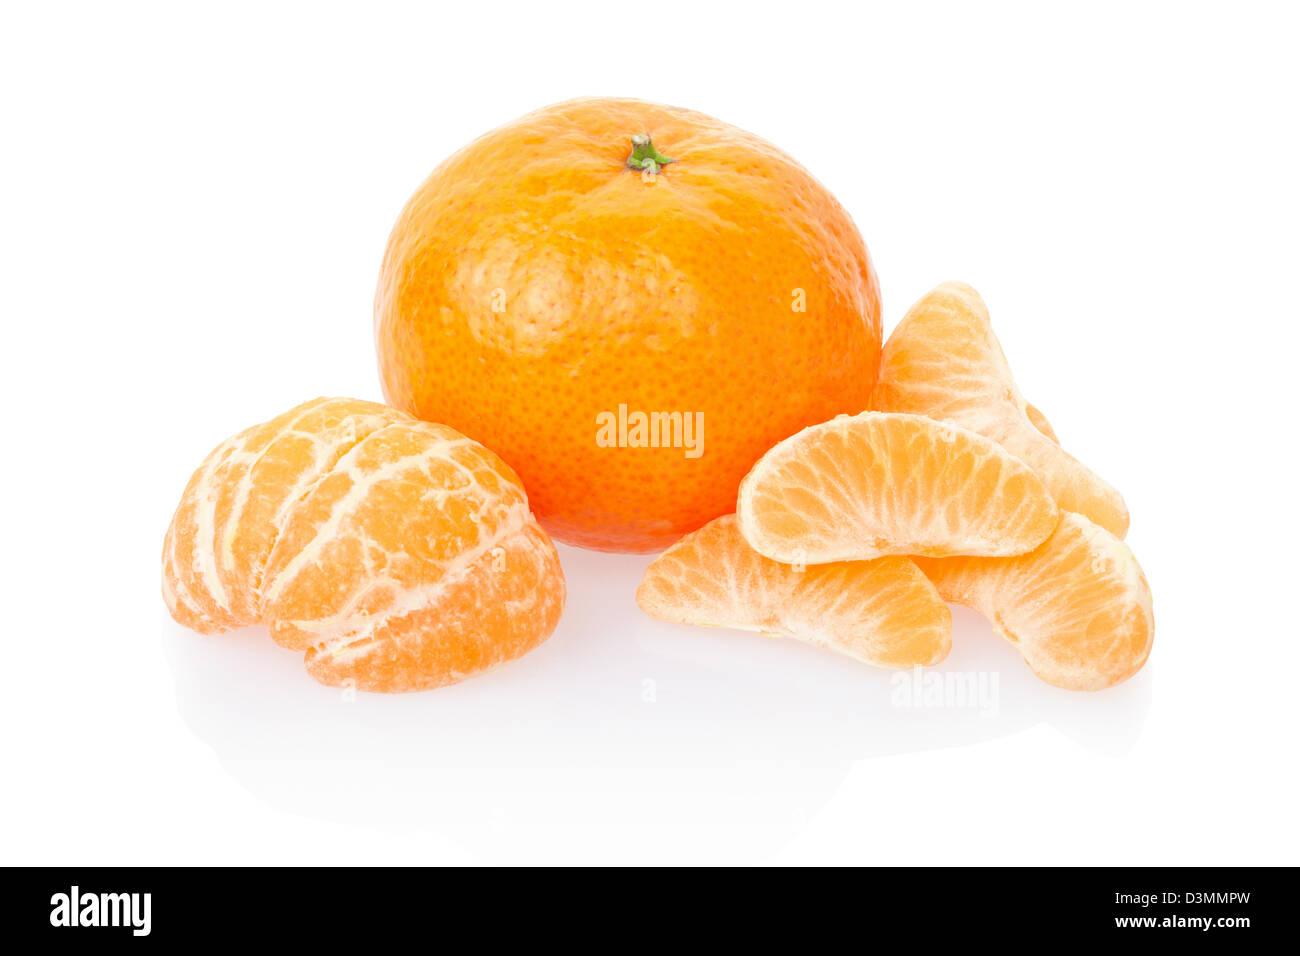 Tangerine or mandarin and segments - Stock Image